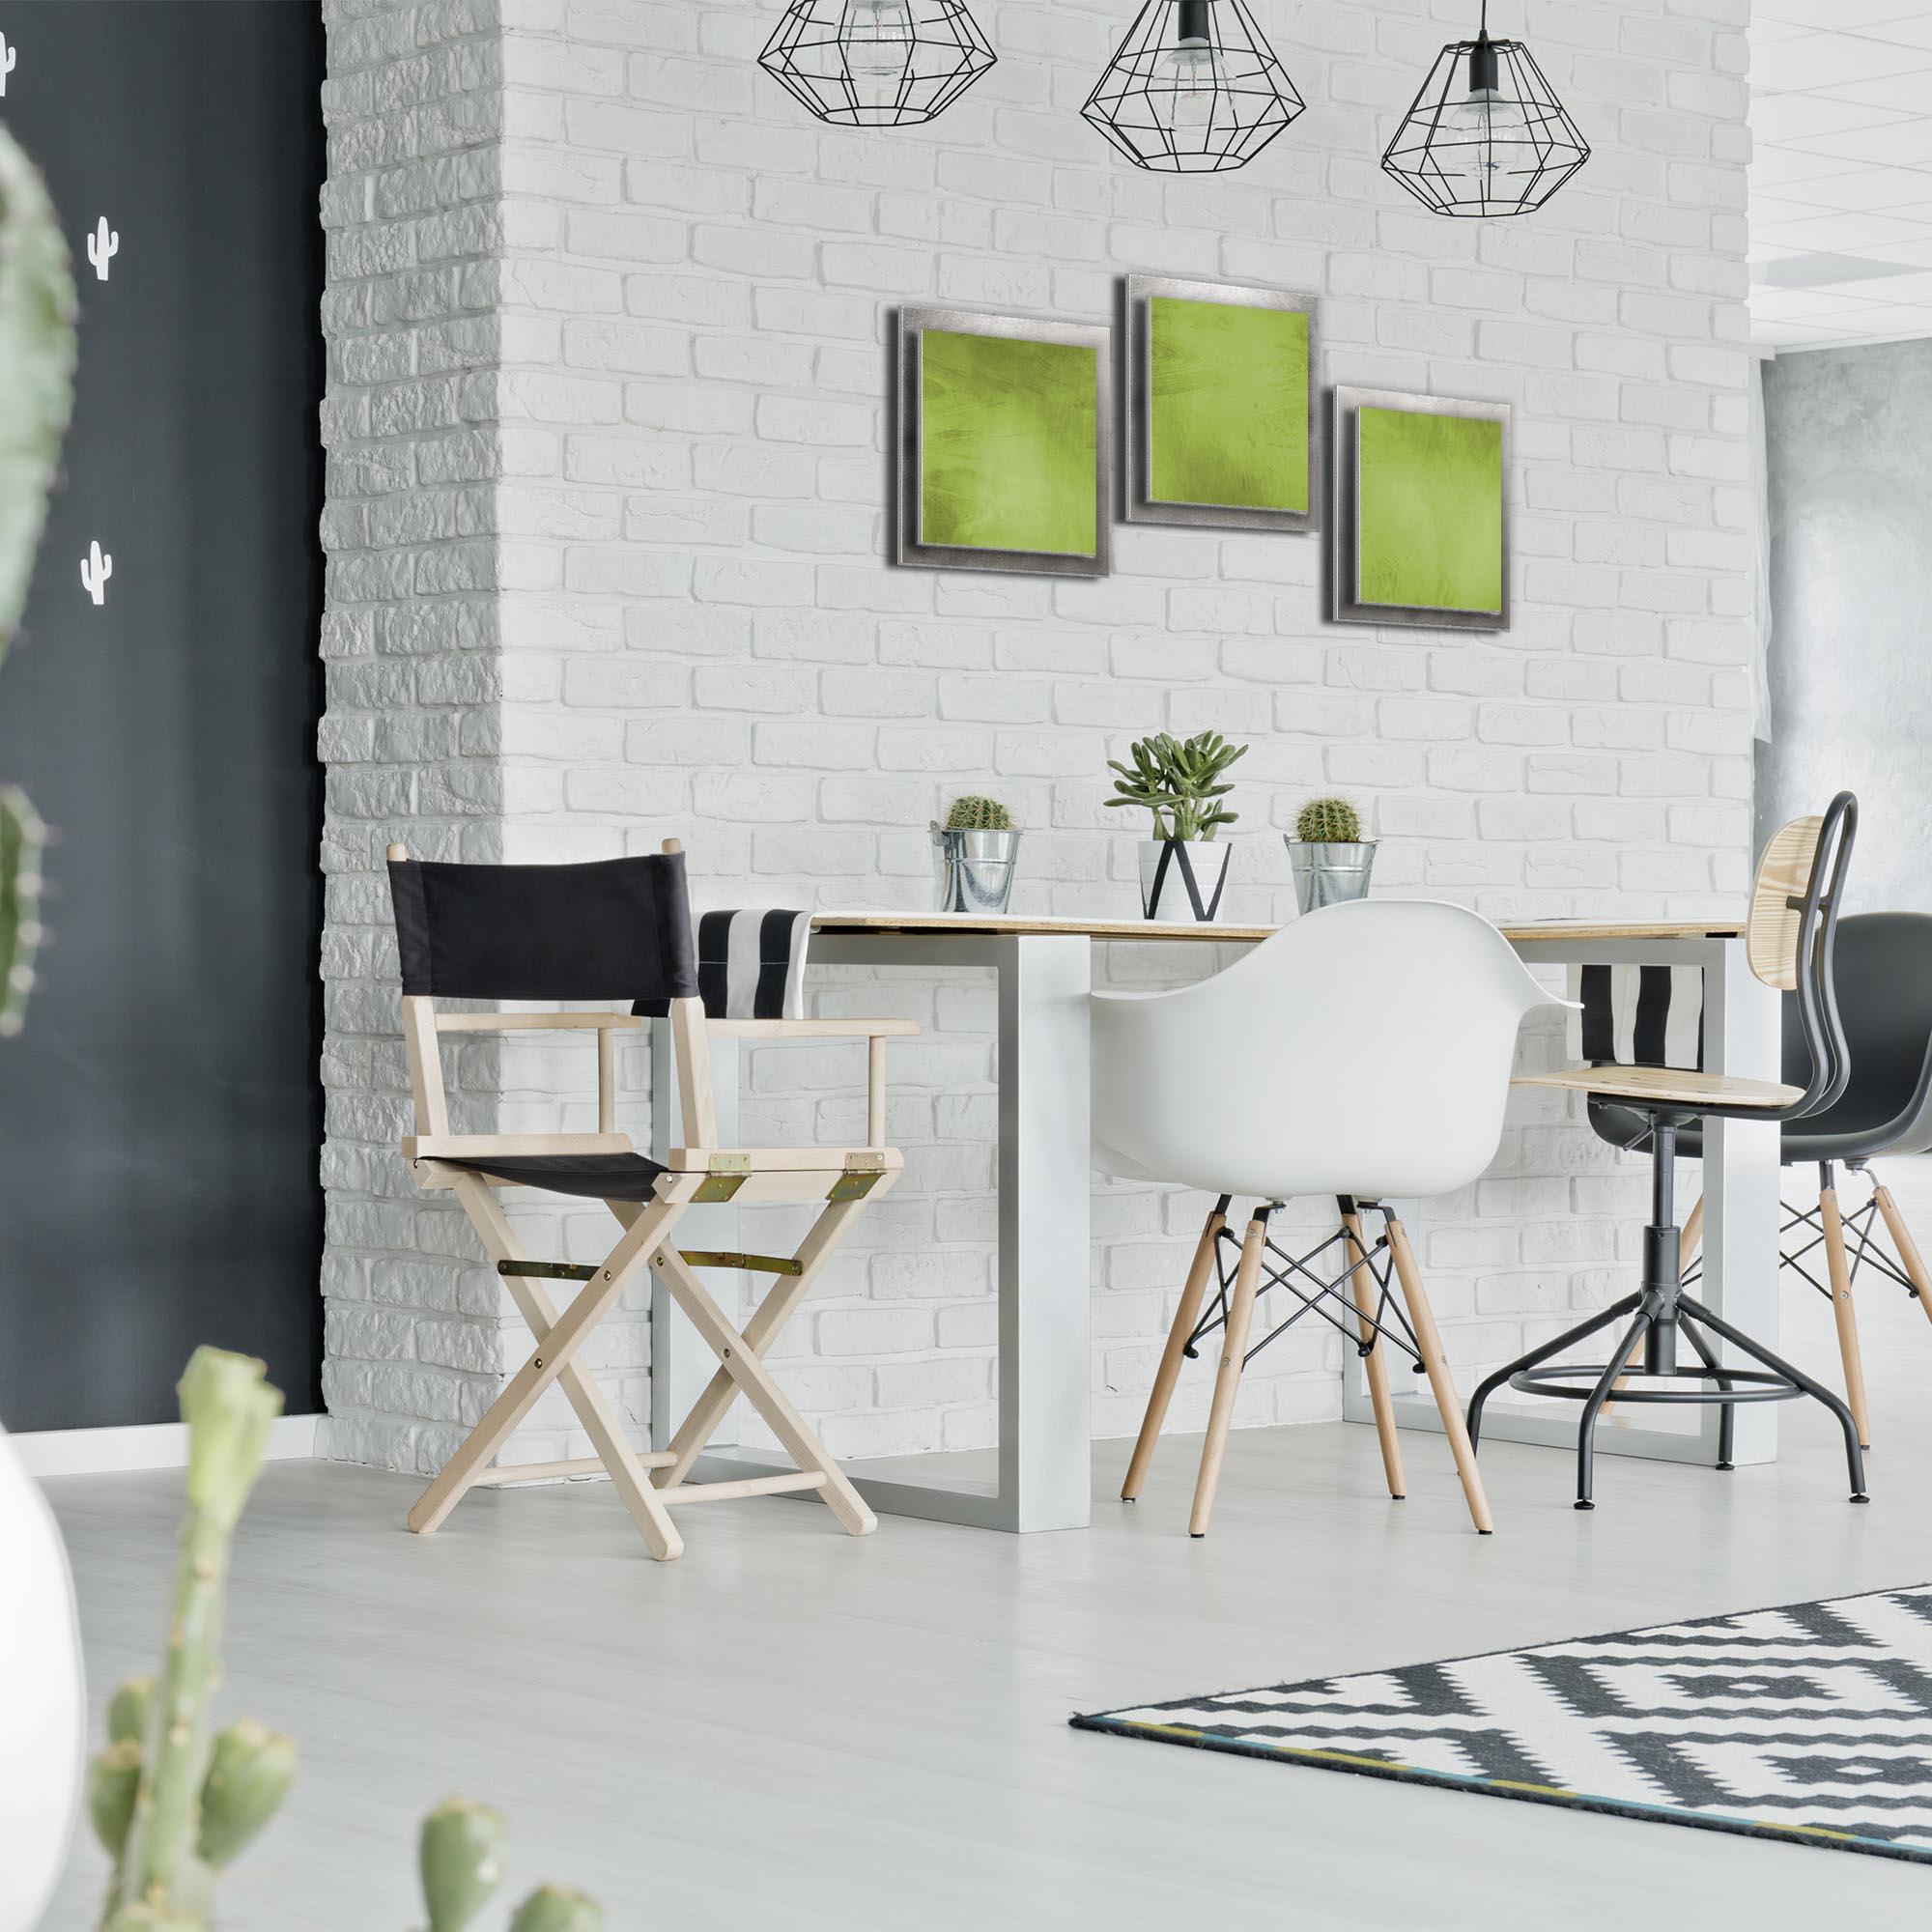 Green Essence - Layered Modern Metal Wall Art - Lifestyle Image